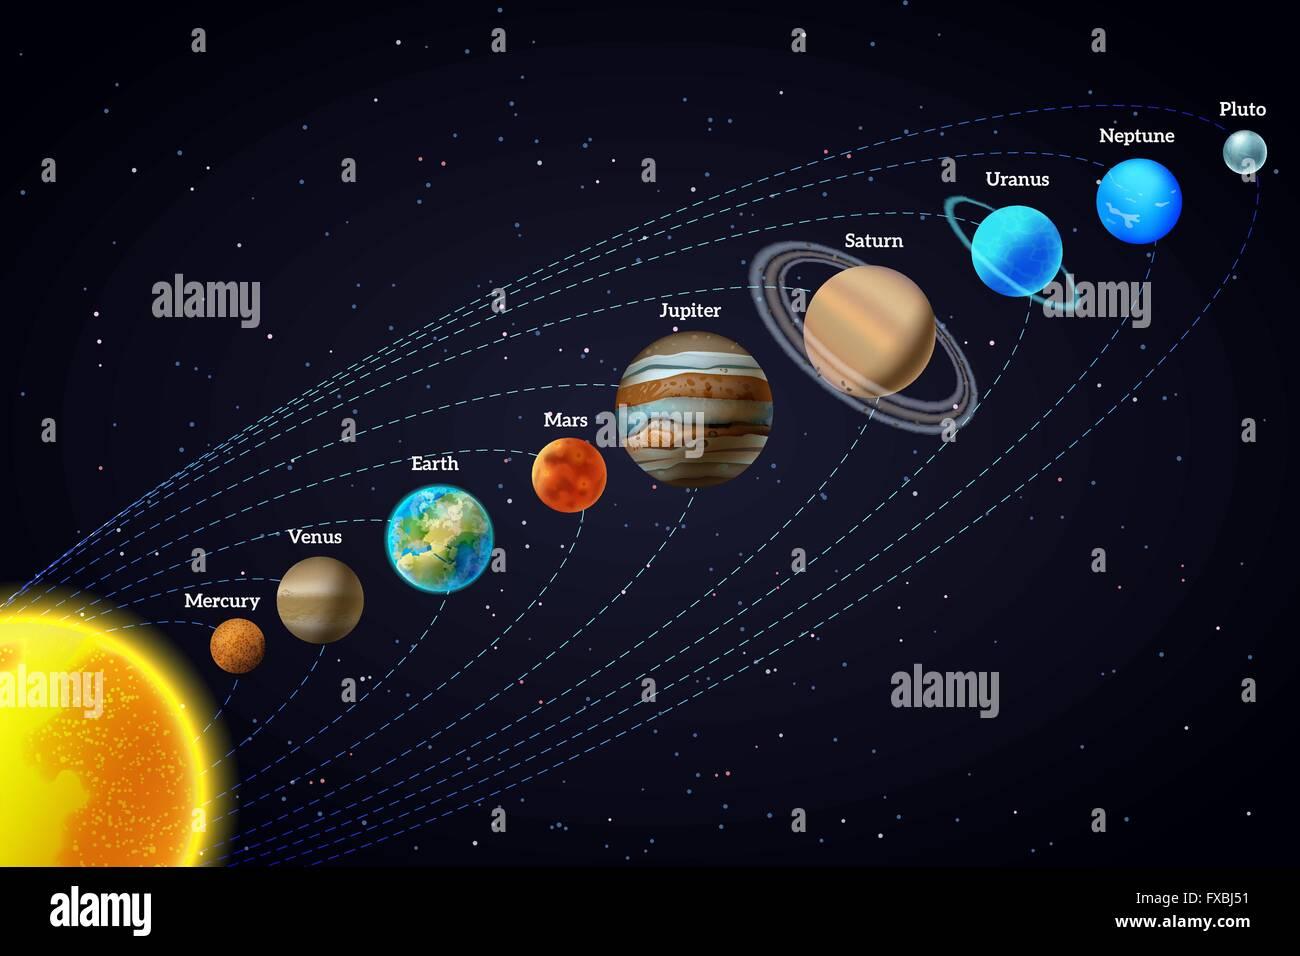 sonnensystem astronomie banner vektor abbildung  bild